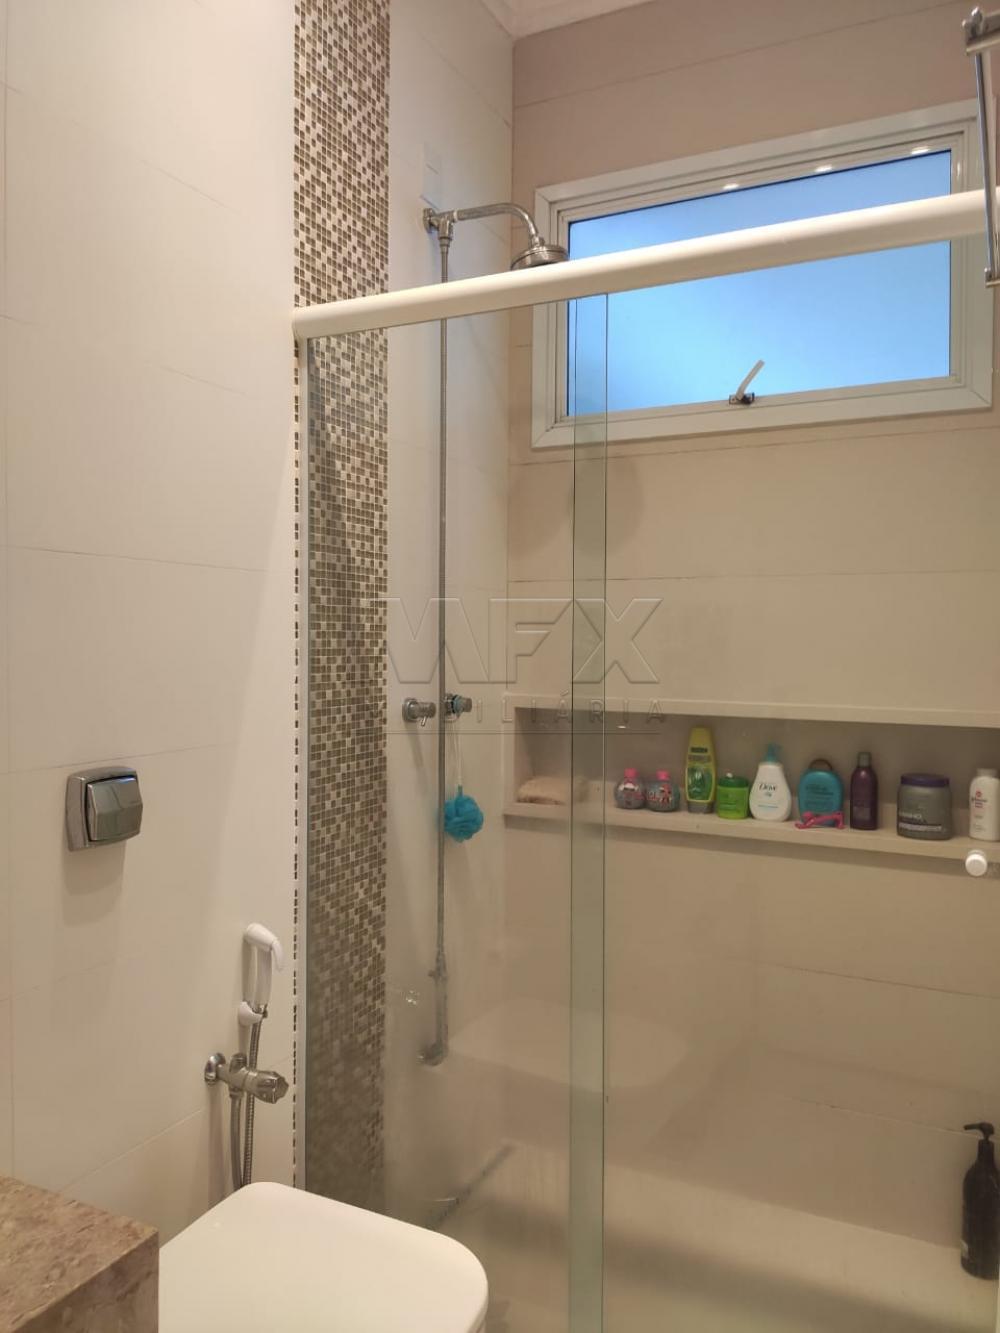 Comprar Casa / Condomínio em Bauru apenas R$ 1.800.000,00 - Foto 32